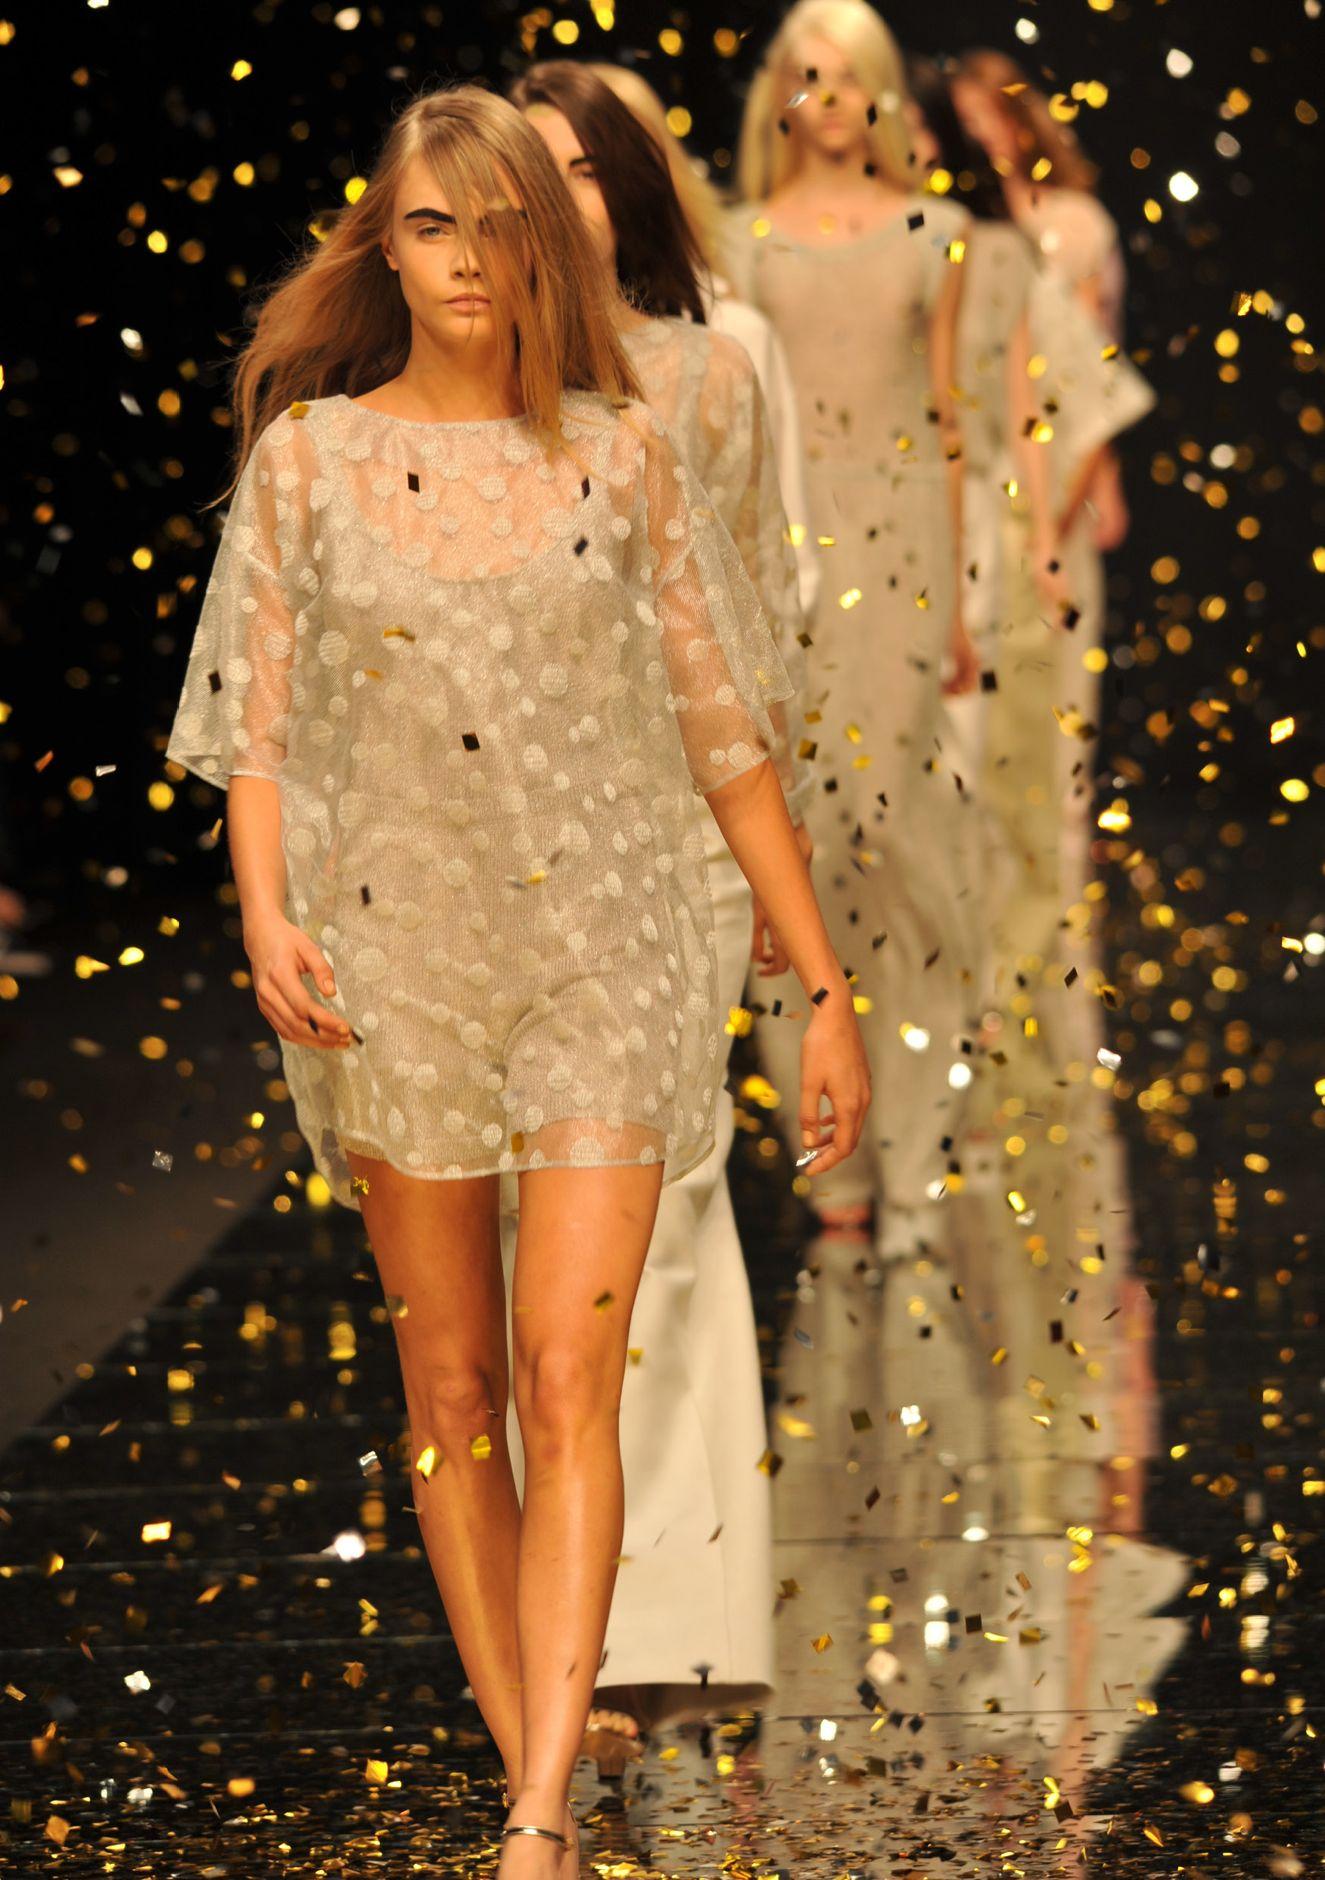 Anteprima Spring Summer 2013 Women Collection Milano Fashion Week Runway Finale